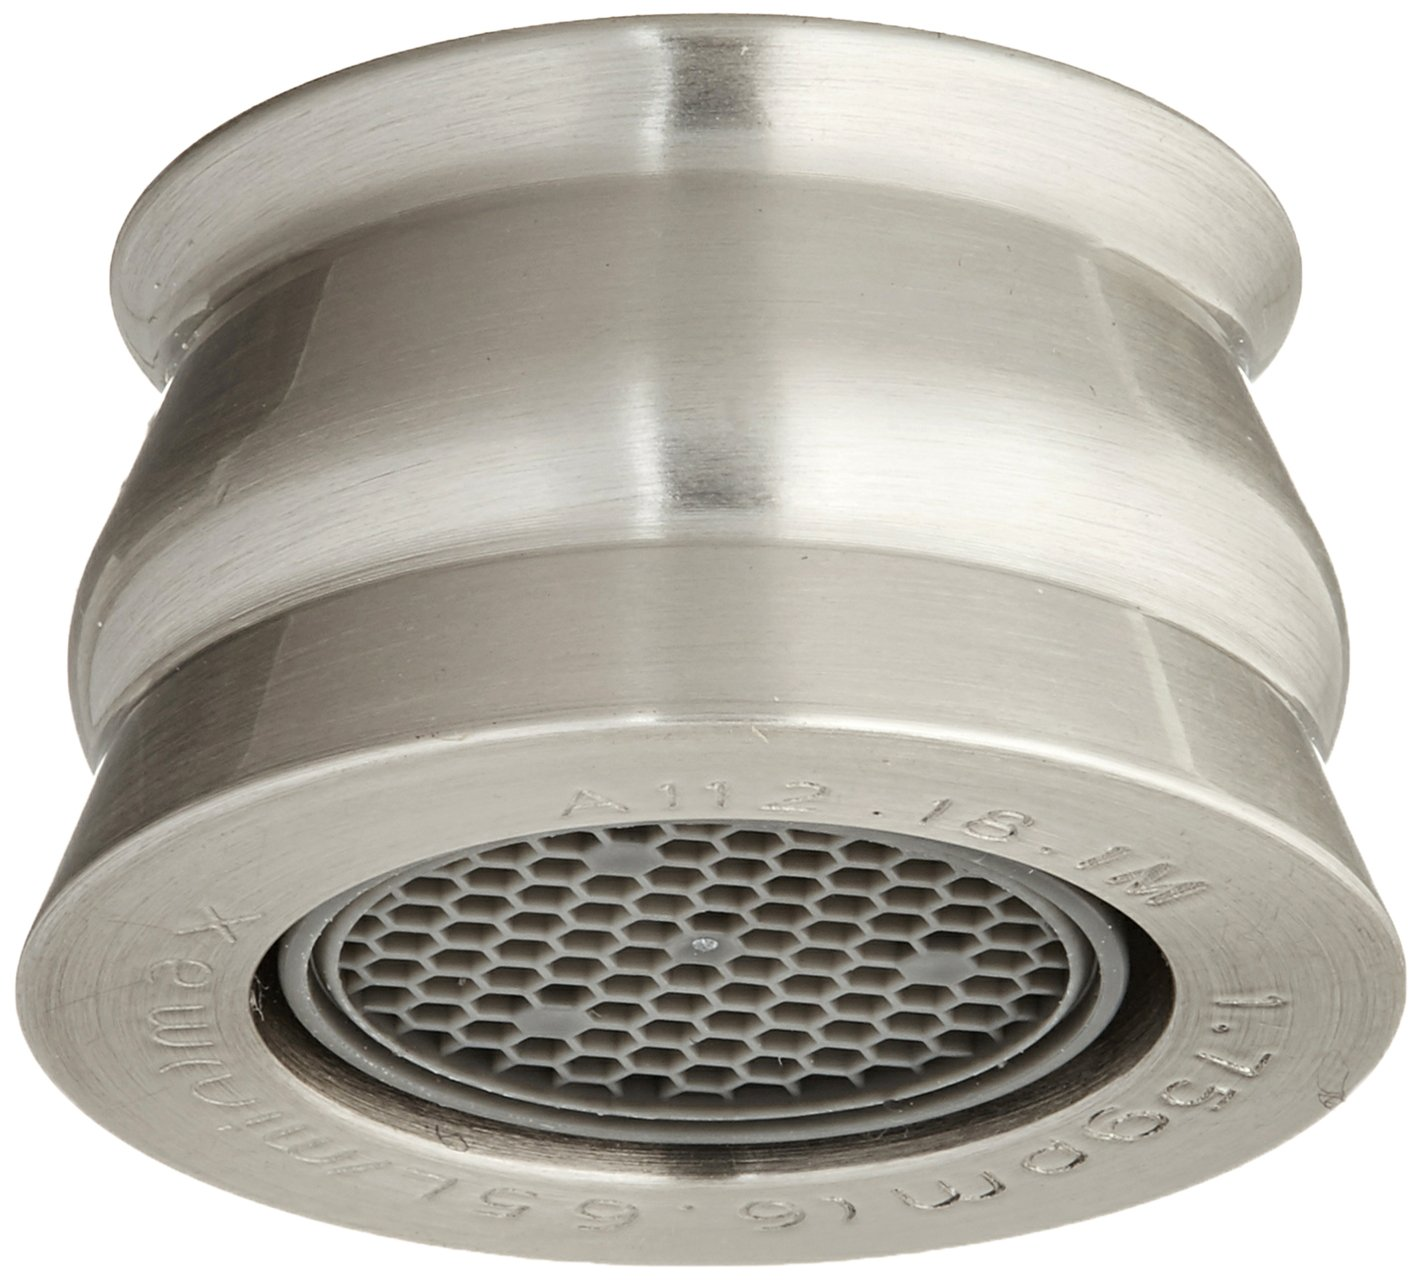 Danze DA500186NBN Standard Female Faucet Aerator Kit, 1.75 GPM, Brushed Nickel